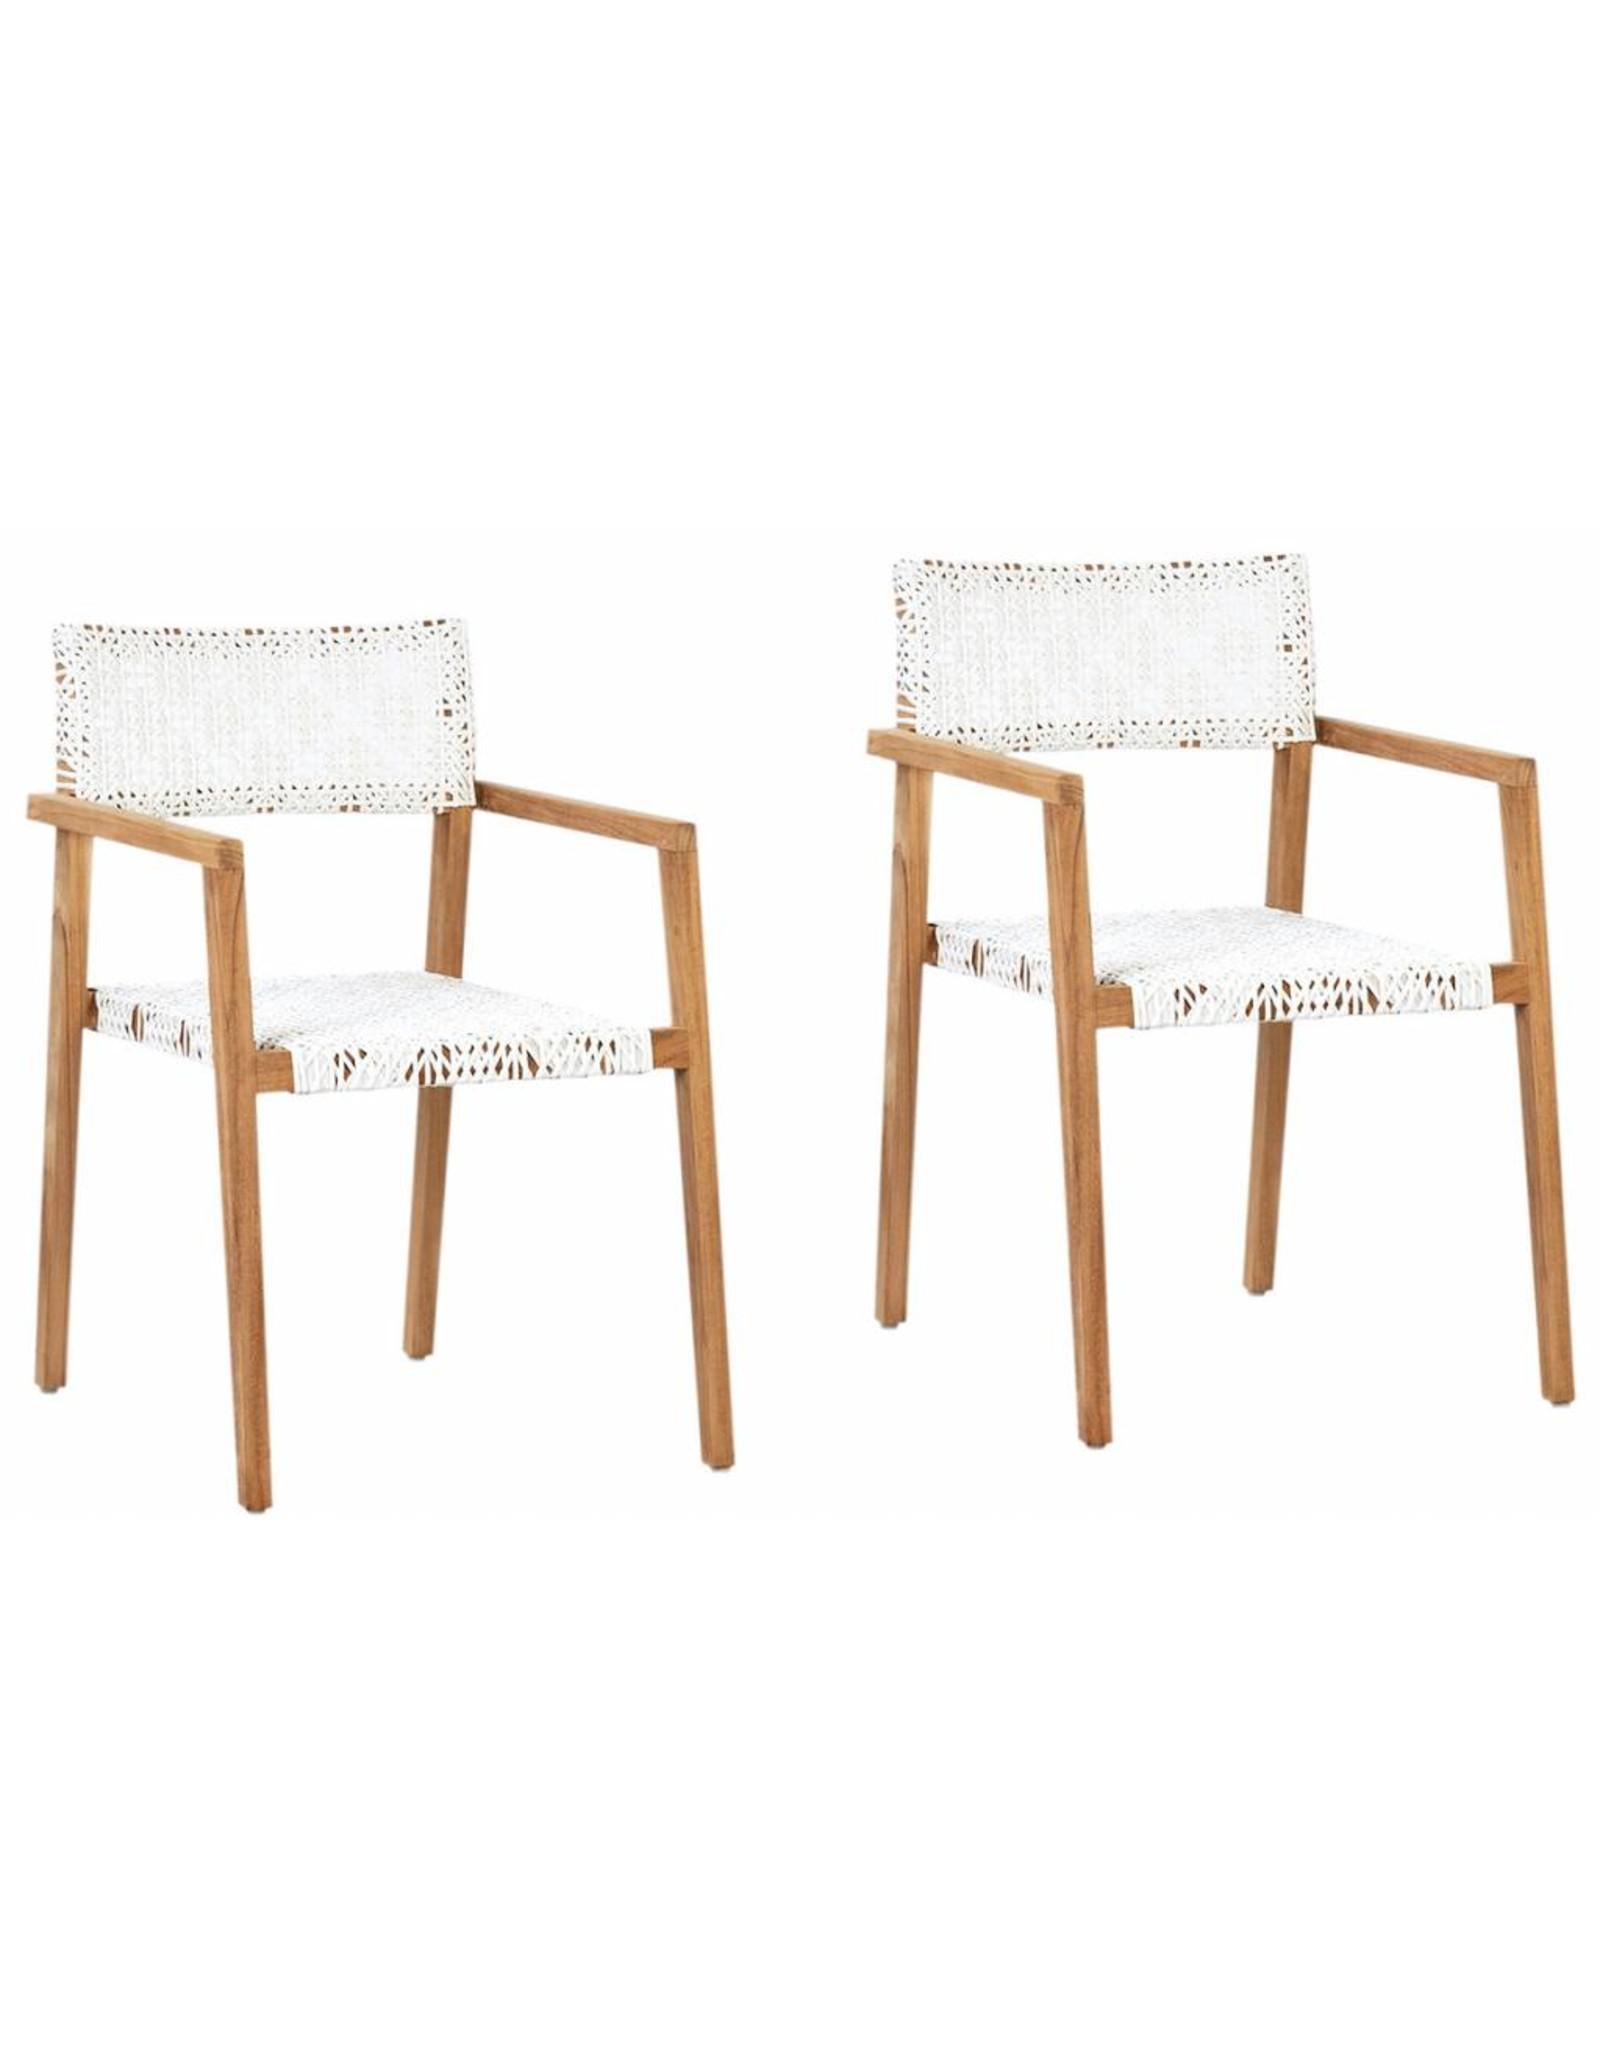 Deeta Chair w/ White Wash